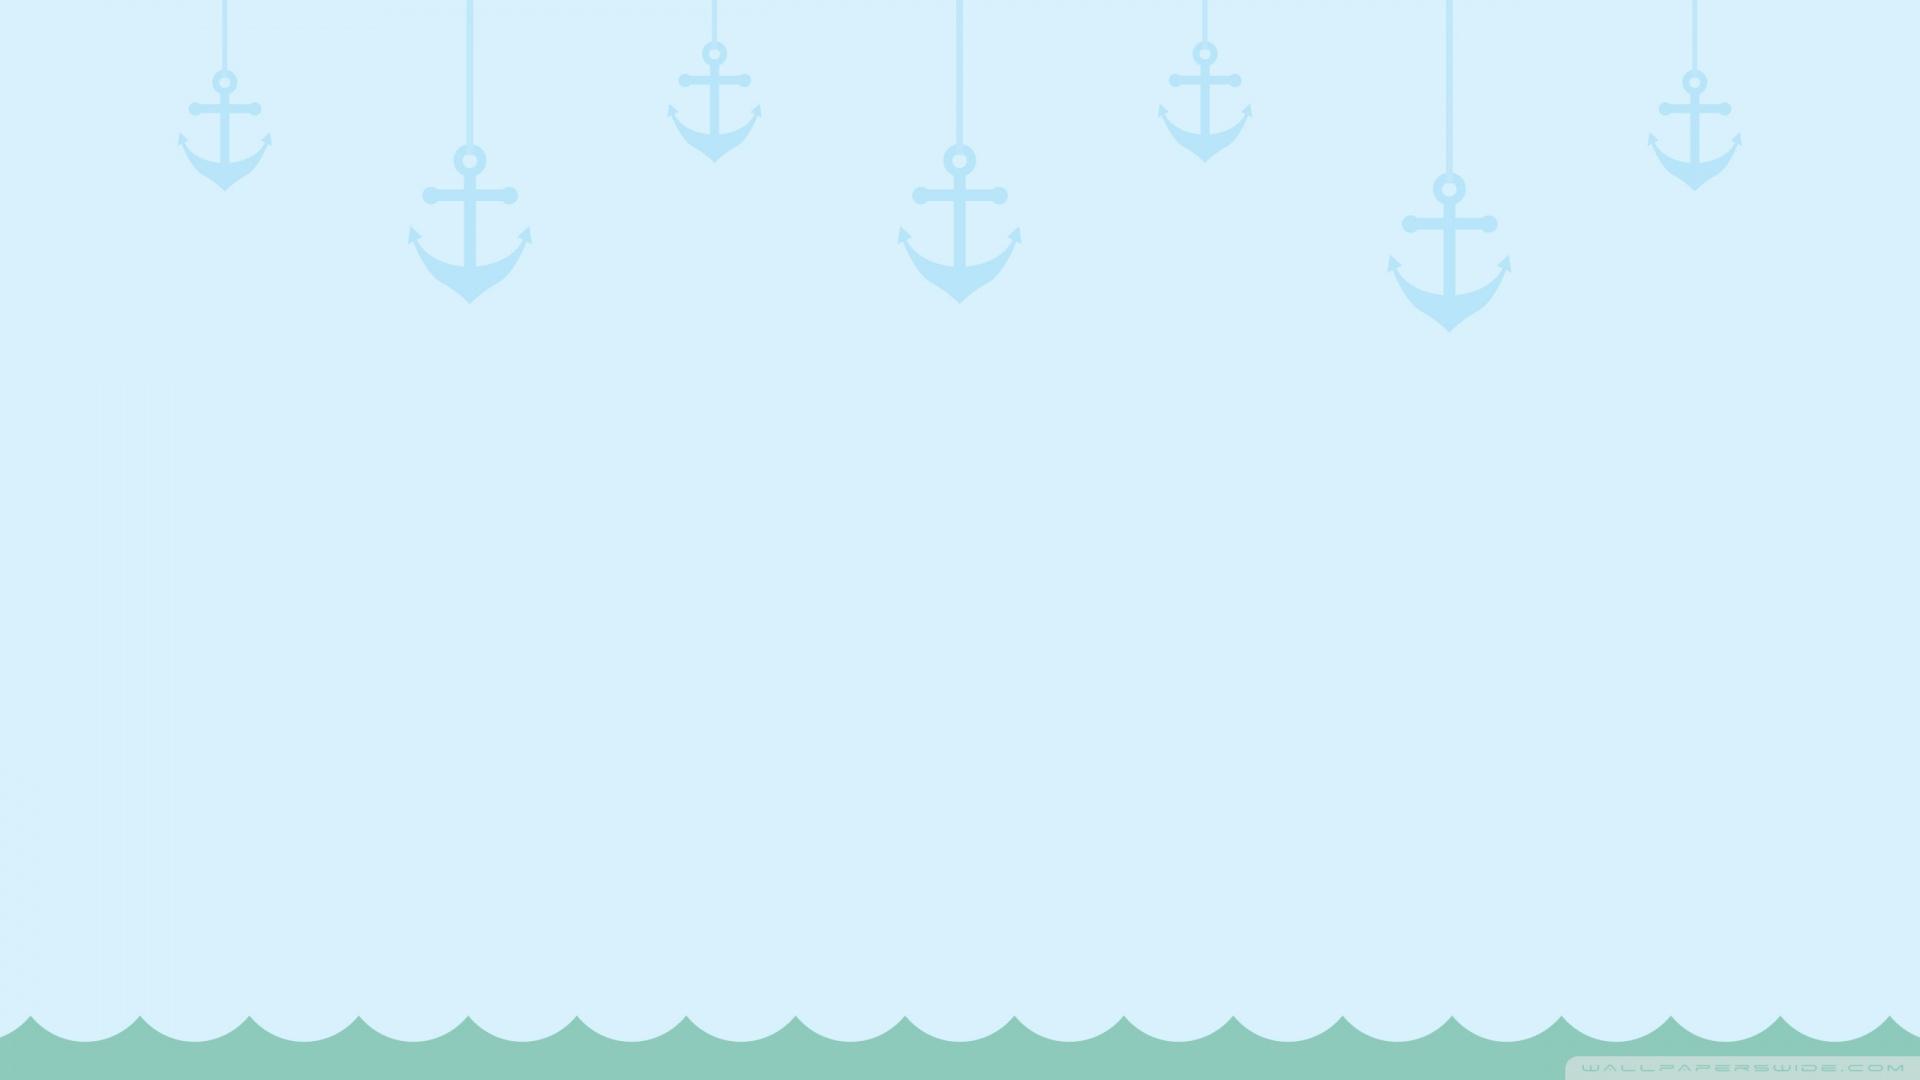 download Nautical Desktop Backgrounds Ship anchors wallpaper 1920x1080